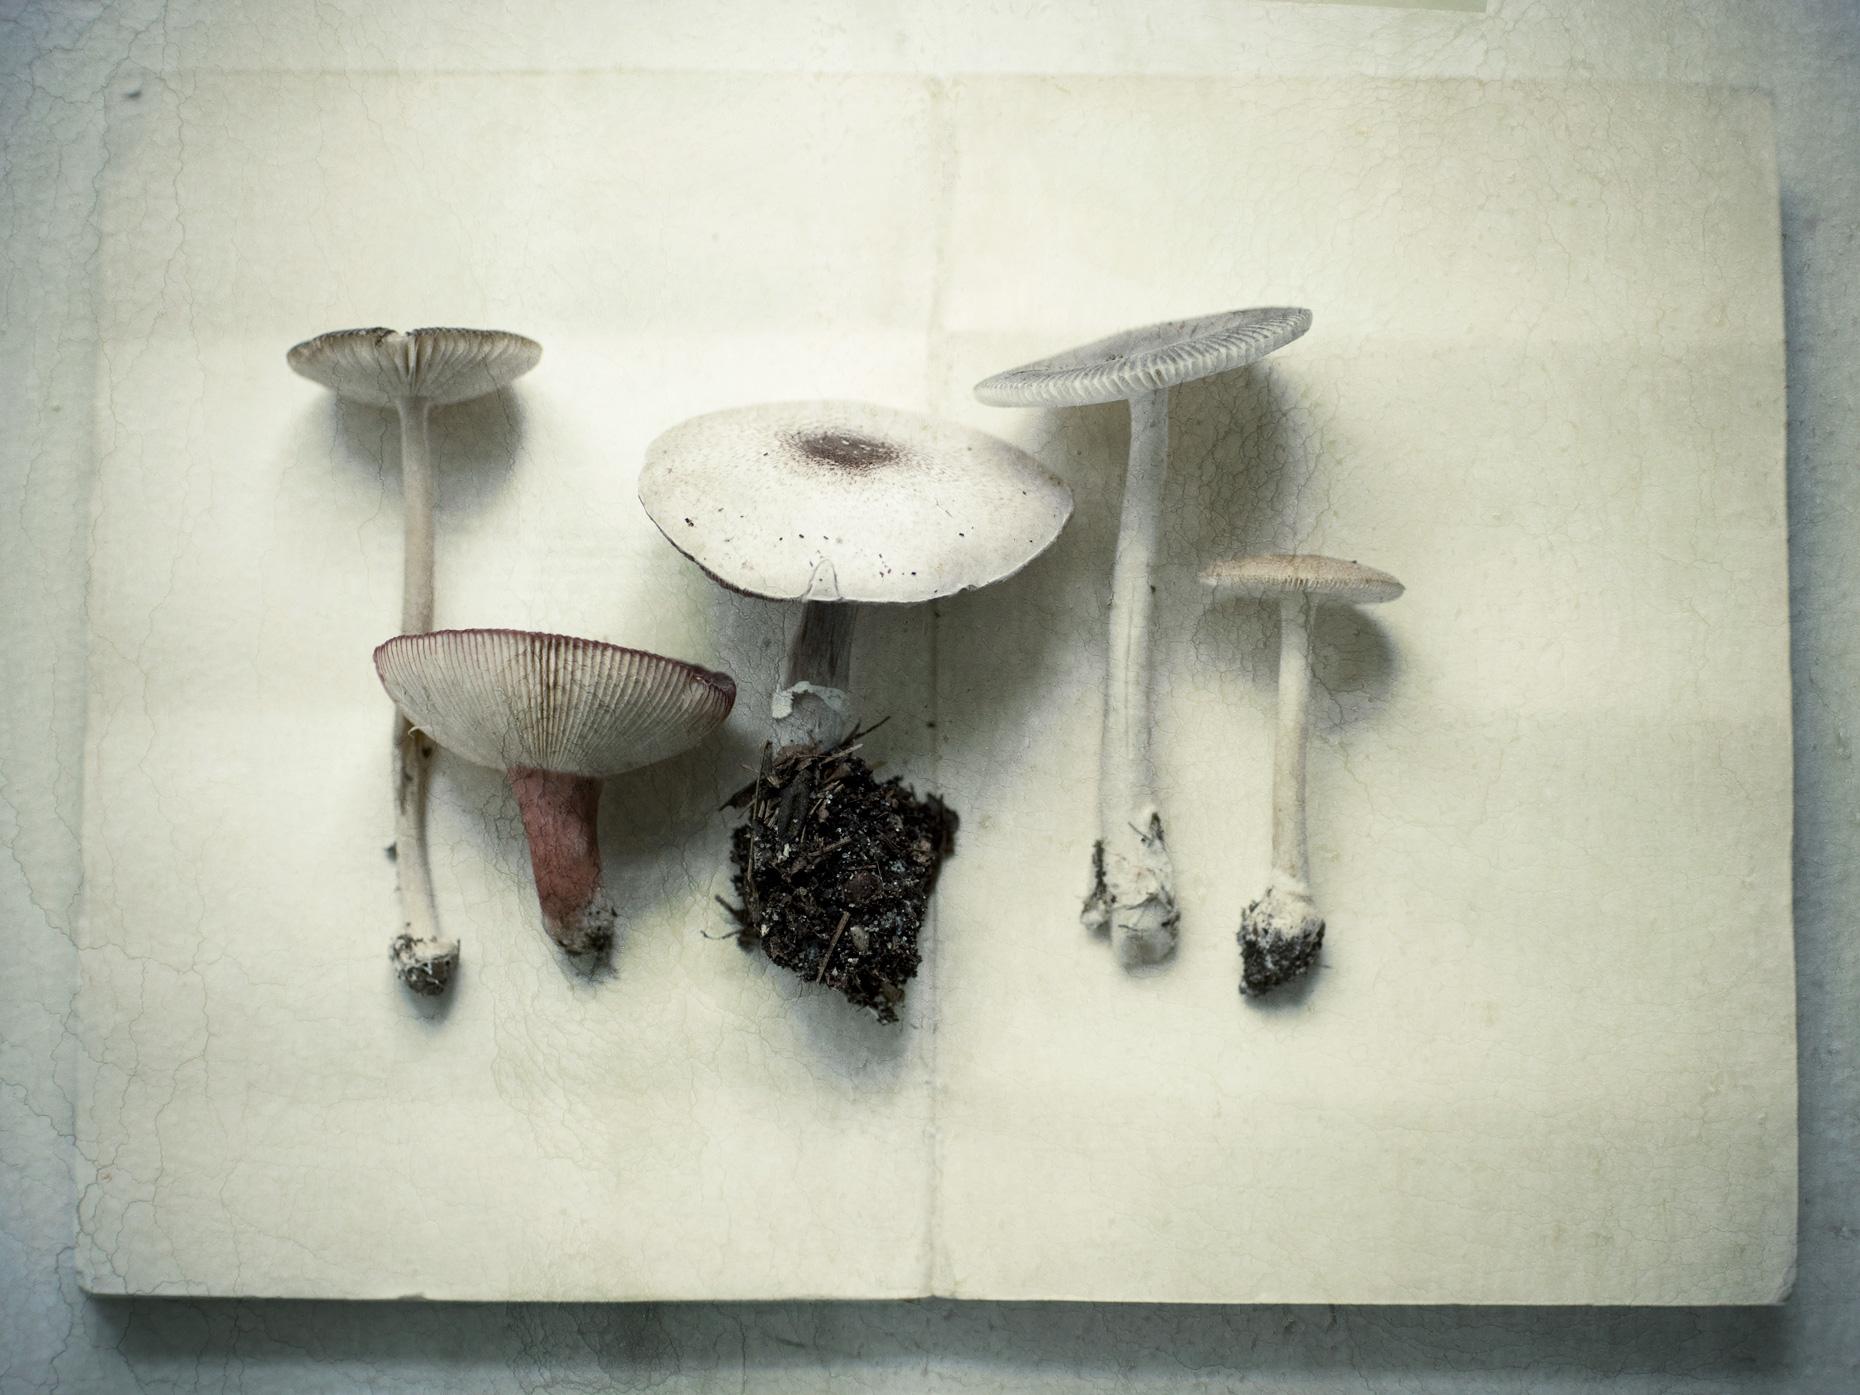 Product Photography Still Life Derek Israelsen 022 Fresh Mushrooms